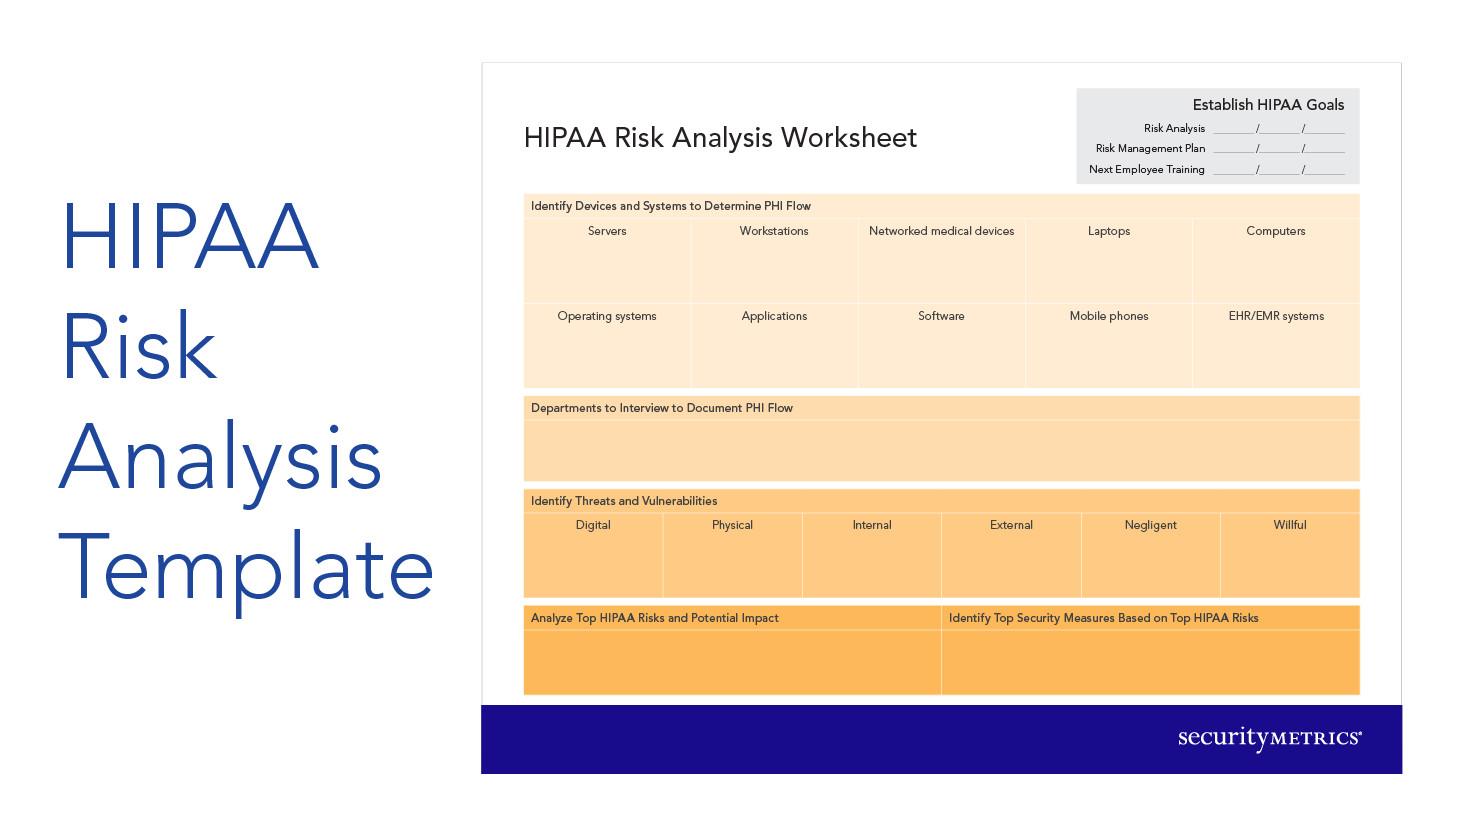 Hipaa Risk Analysis Template How to Start A Hipaa Risk Analysis